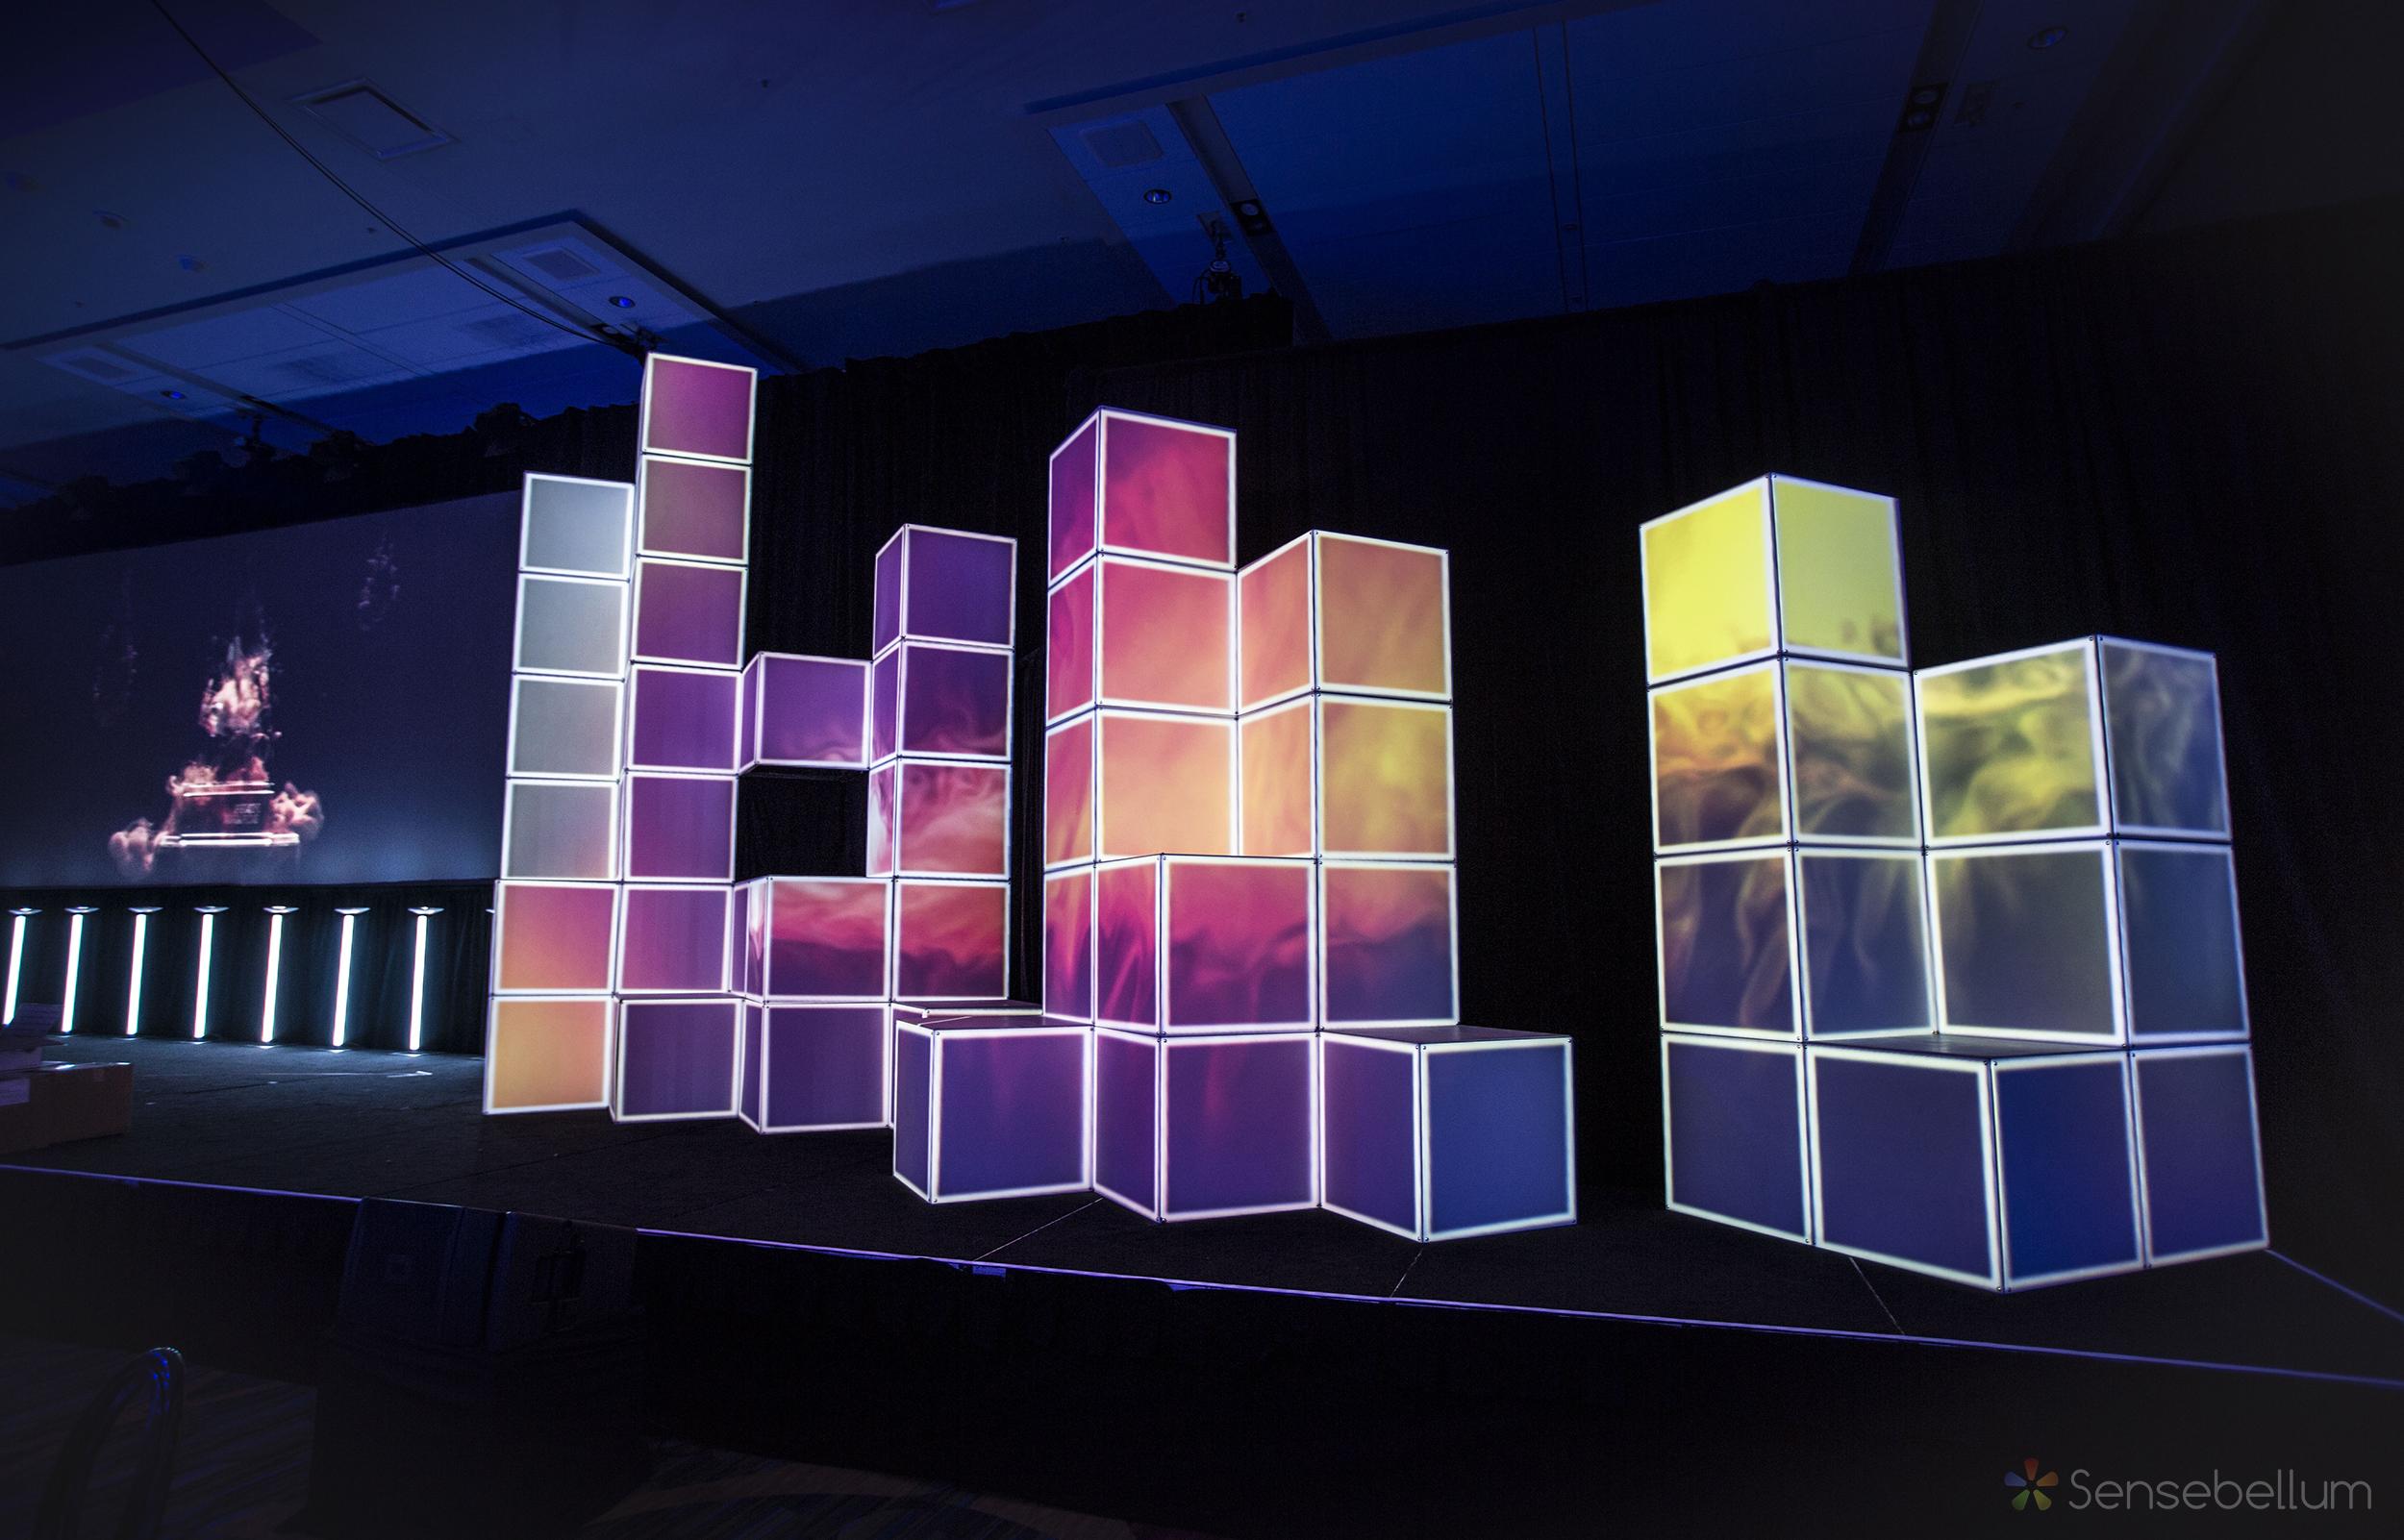 Sensebellum San Francisco projection mapping video event creative lighting company 06 copy.jpg